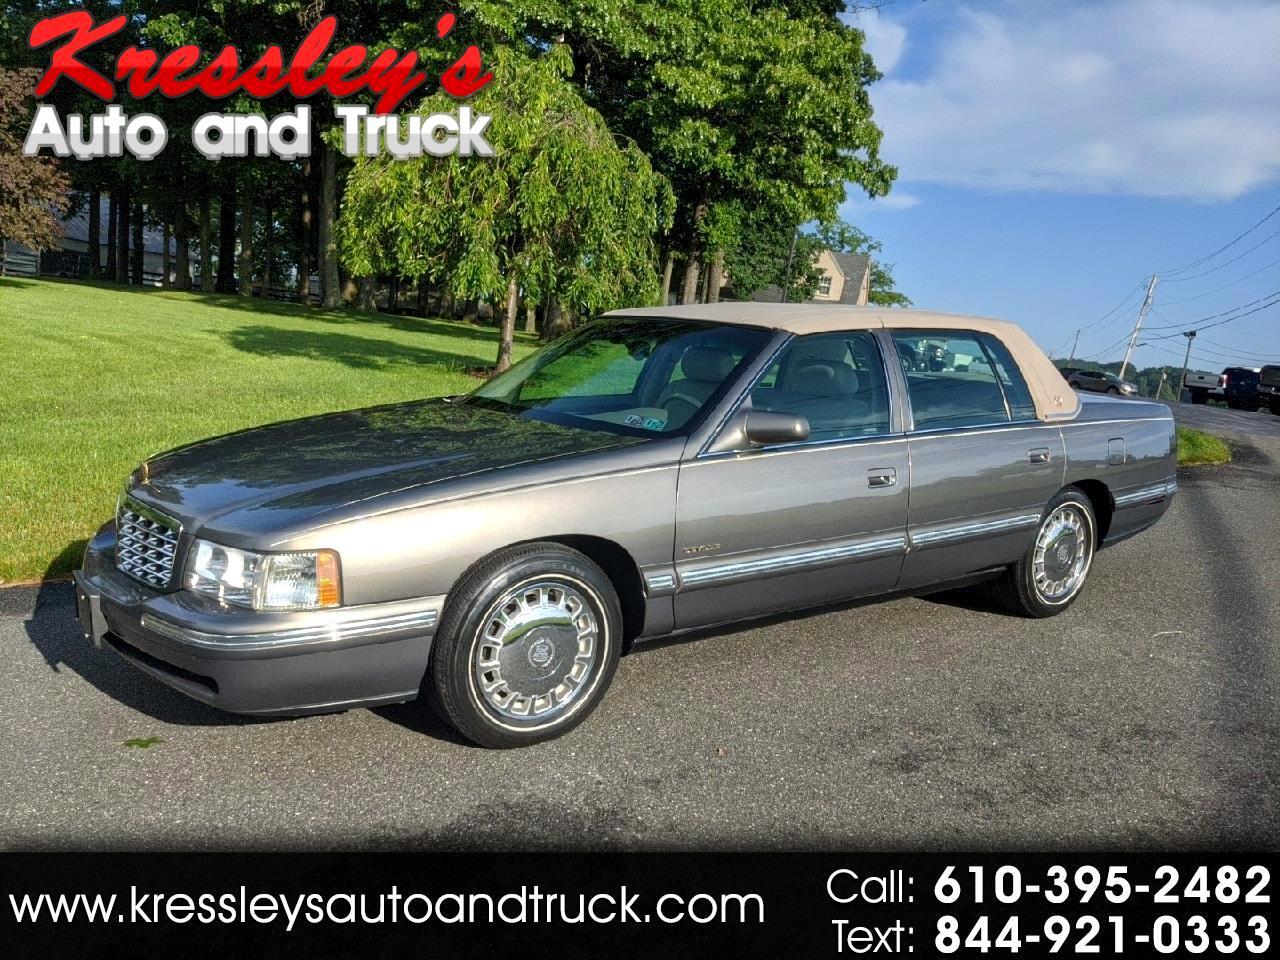 1999 Cadillac DeVille 4dr Sdn